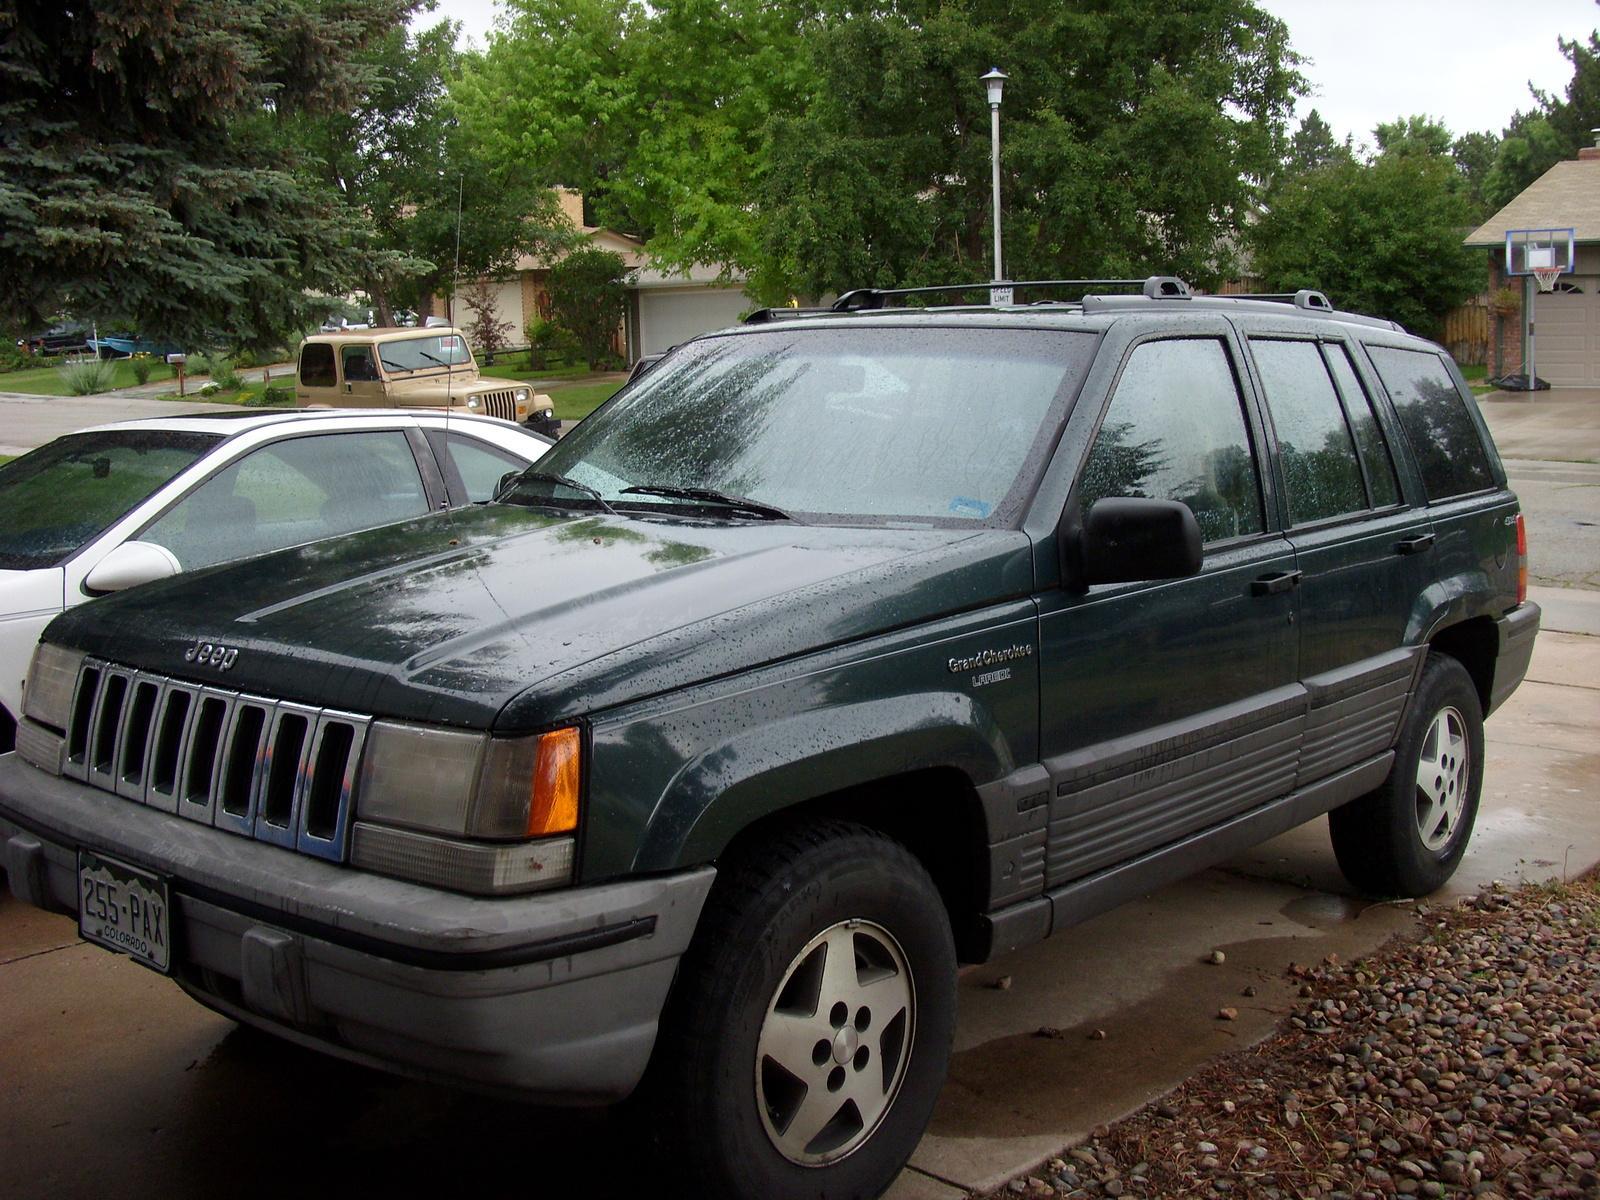 1994 Jeep Grand Cherokee #9 Jeep Grand Cherokee #9 800 1024 1280 1600  origin ...